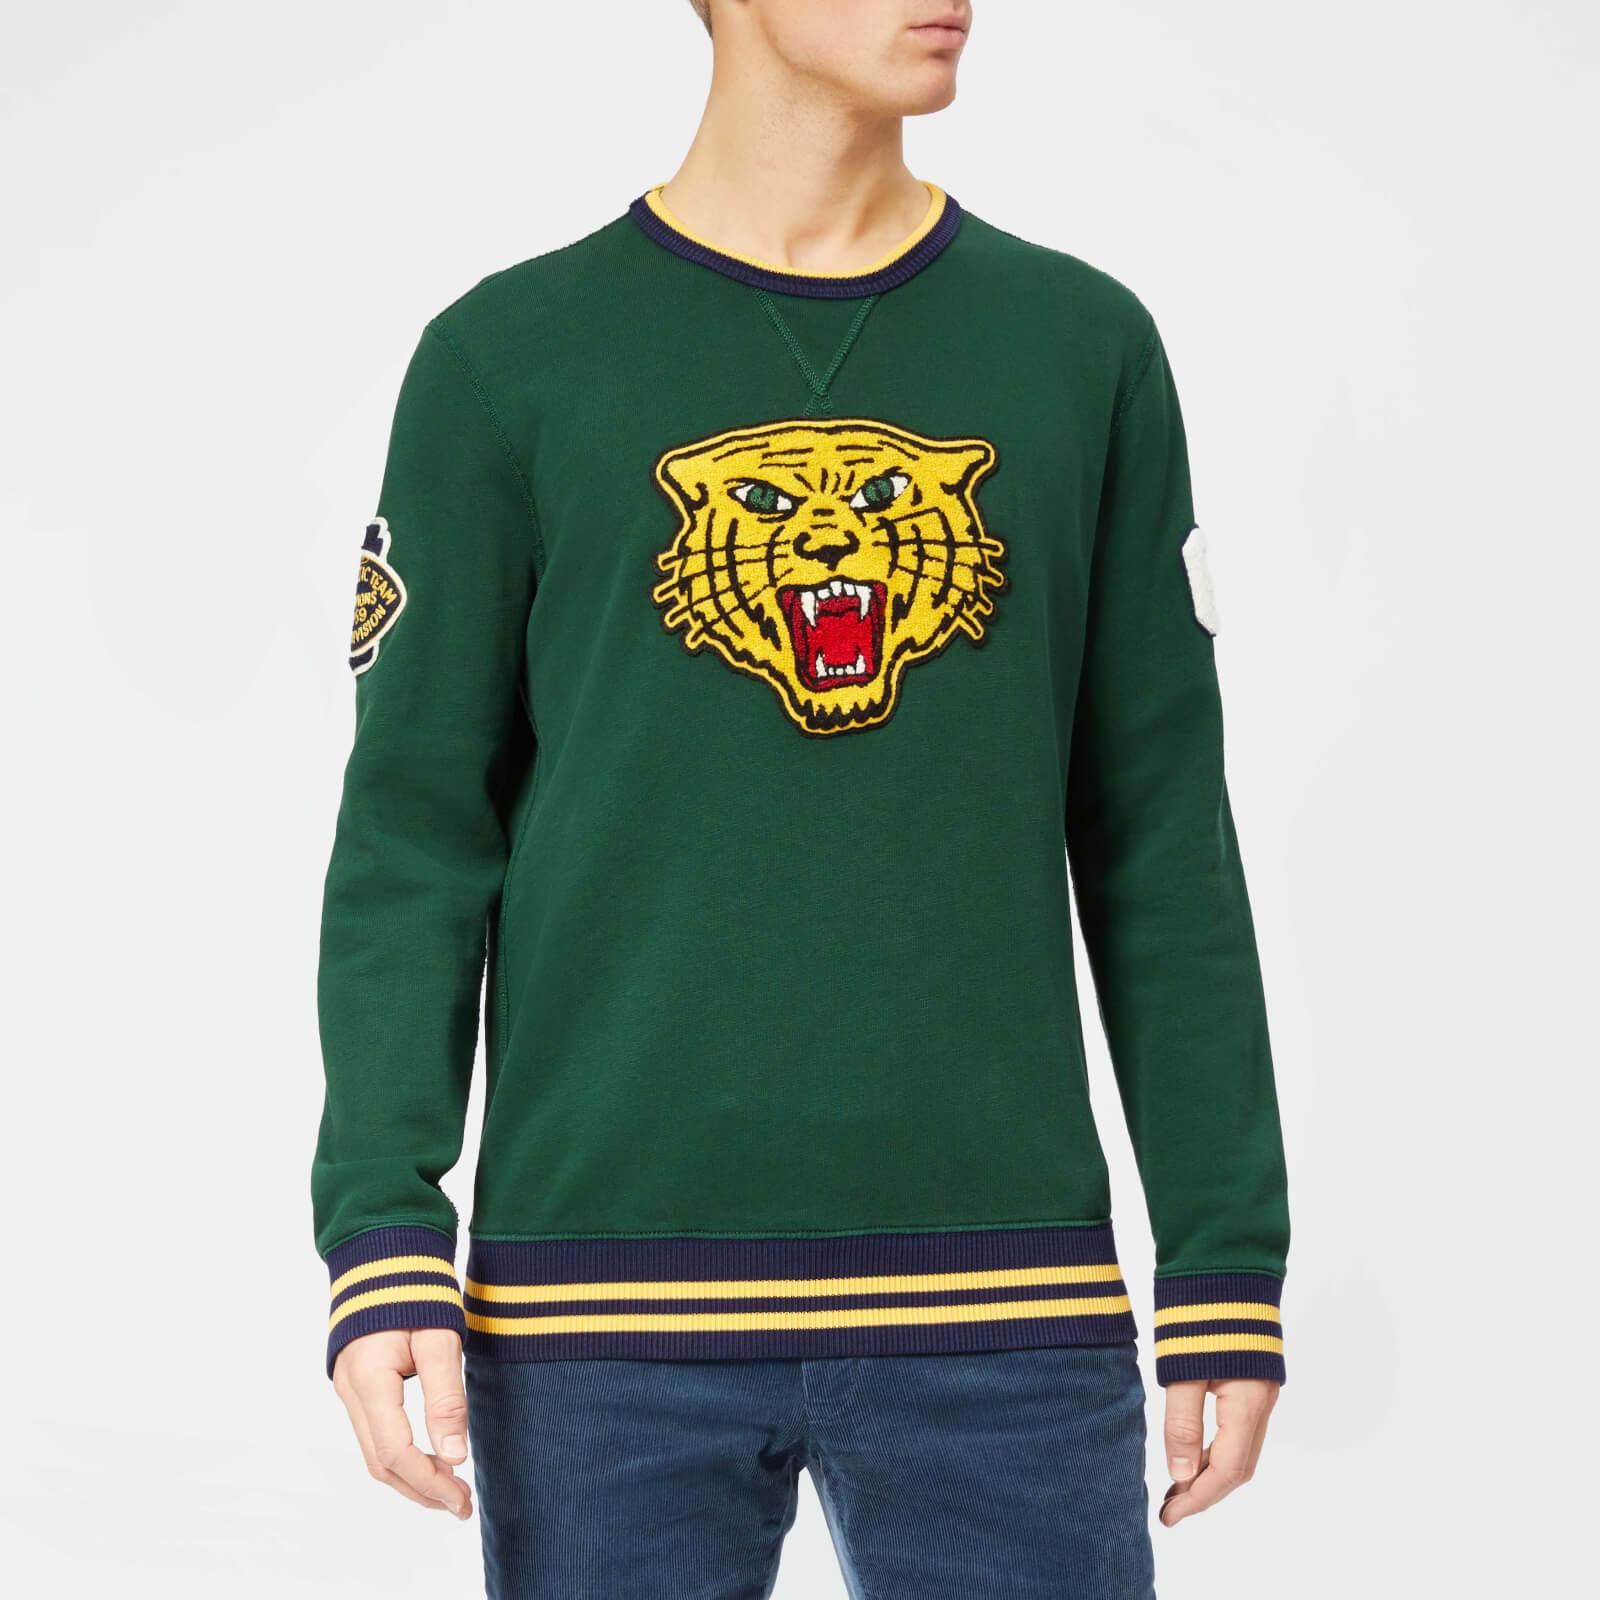 fa70c3e7830 Polo Ralph Lauren Men's Tiger Crew Neck Sweatshirt - College Green